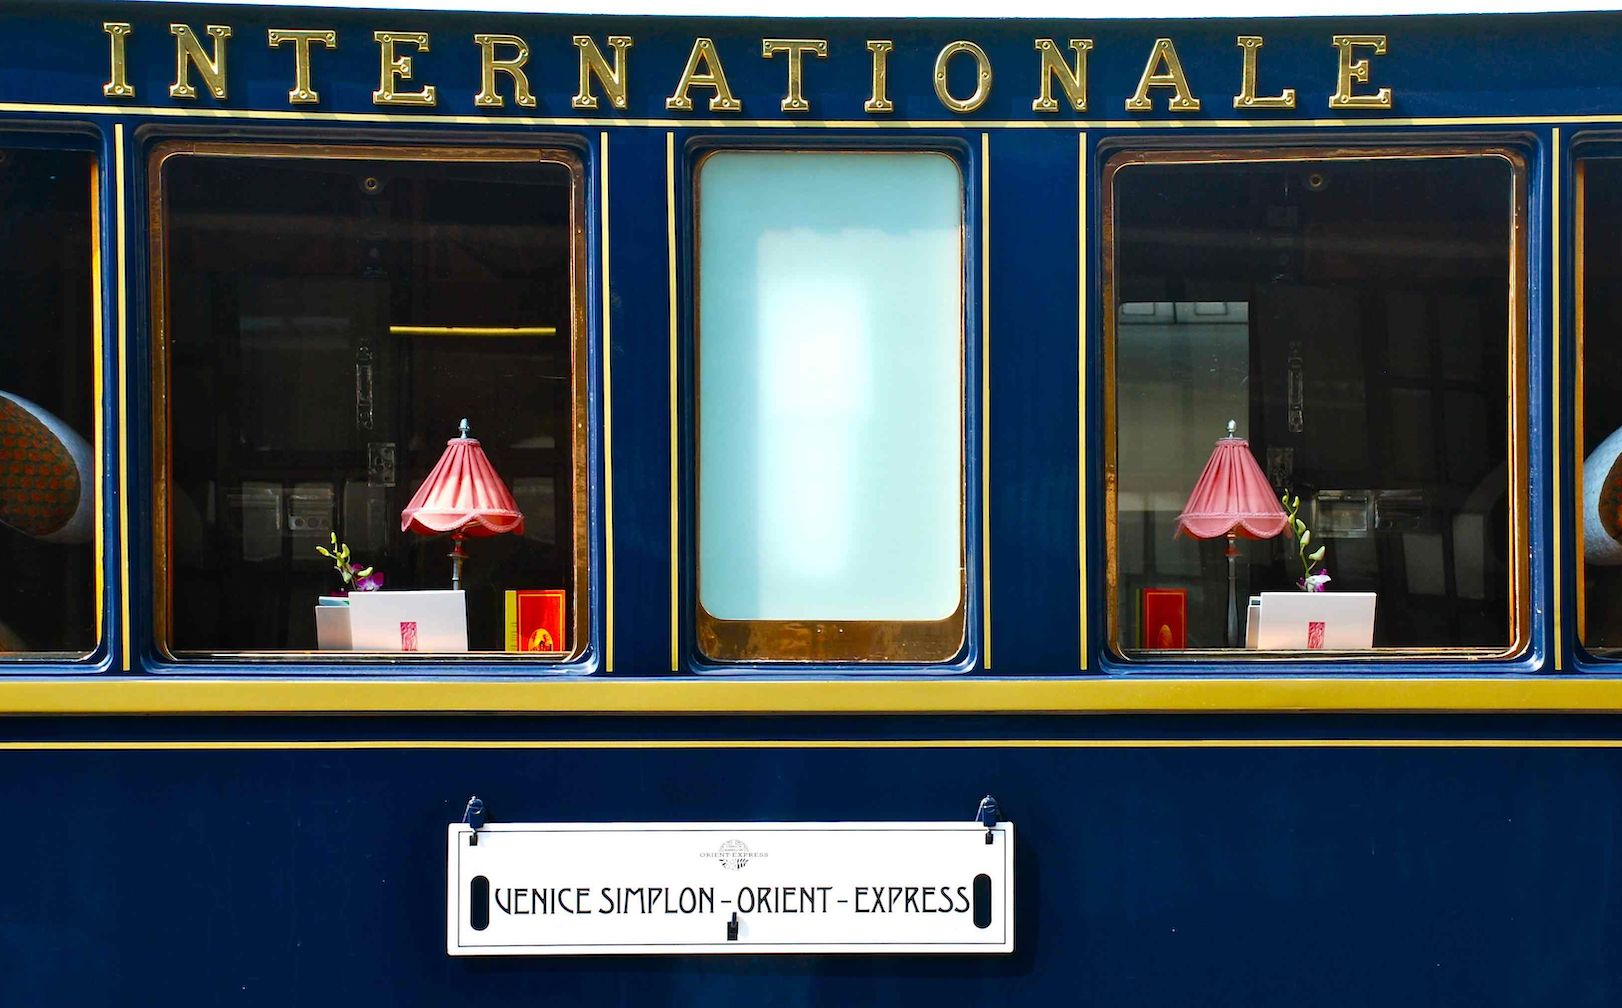 Venice Simplon-Orient-Express VSOE train exterior